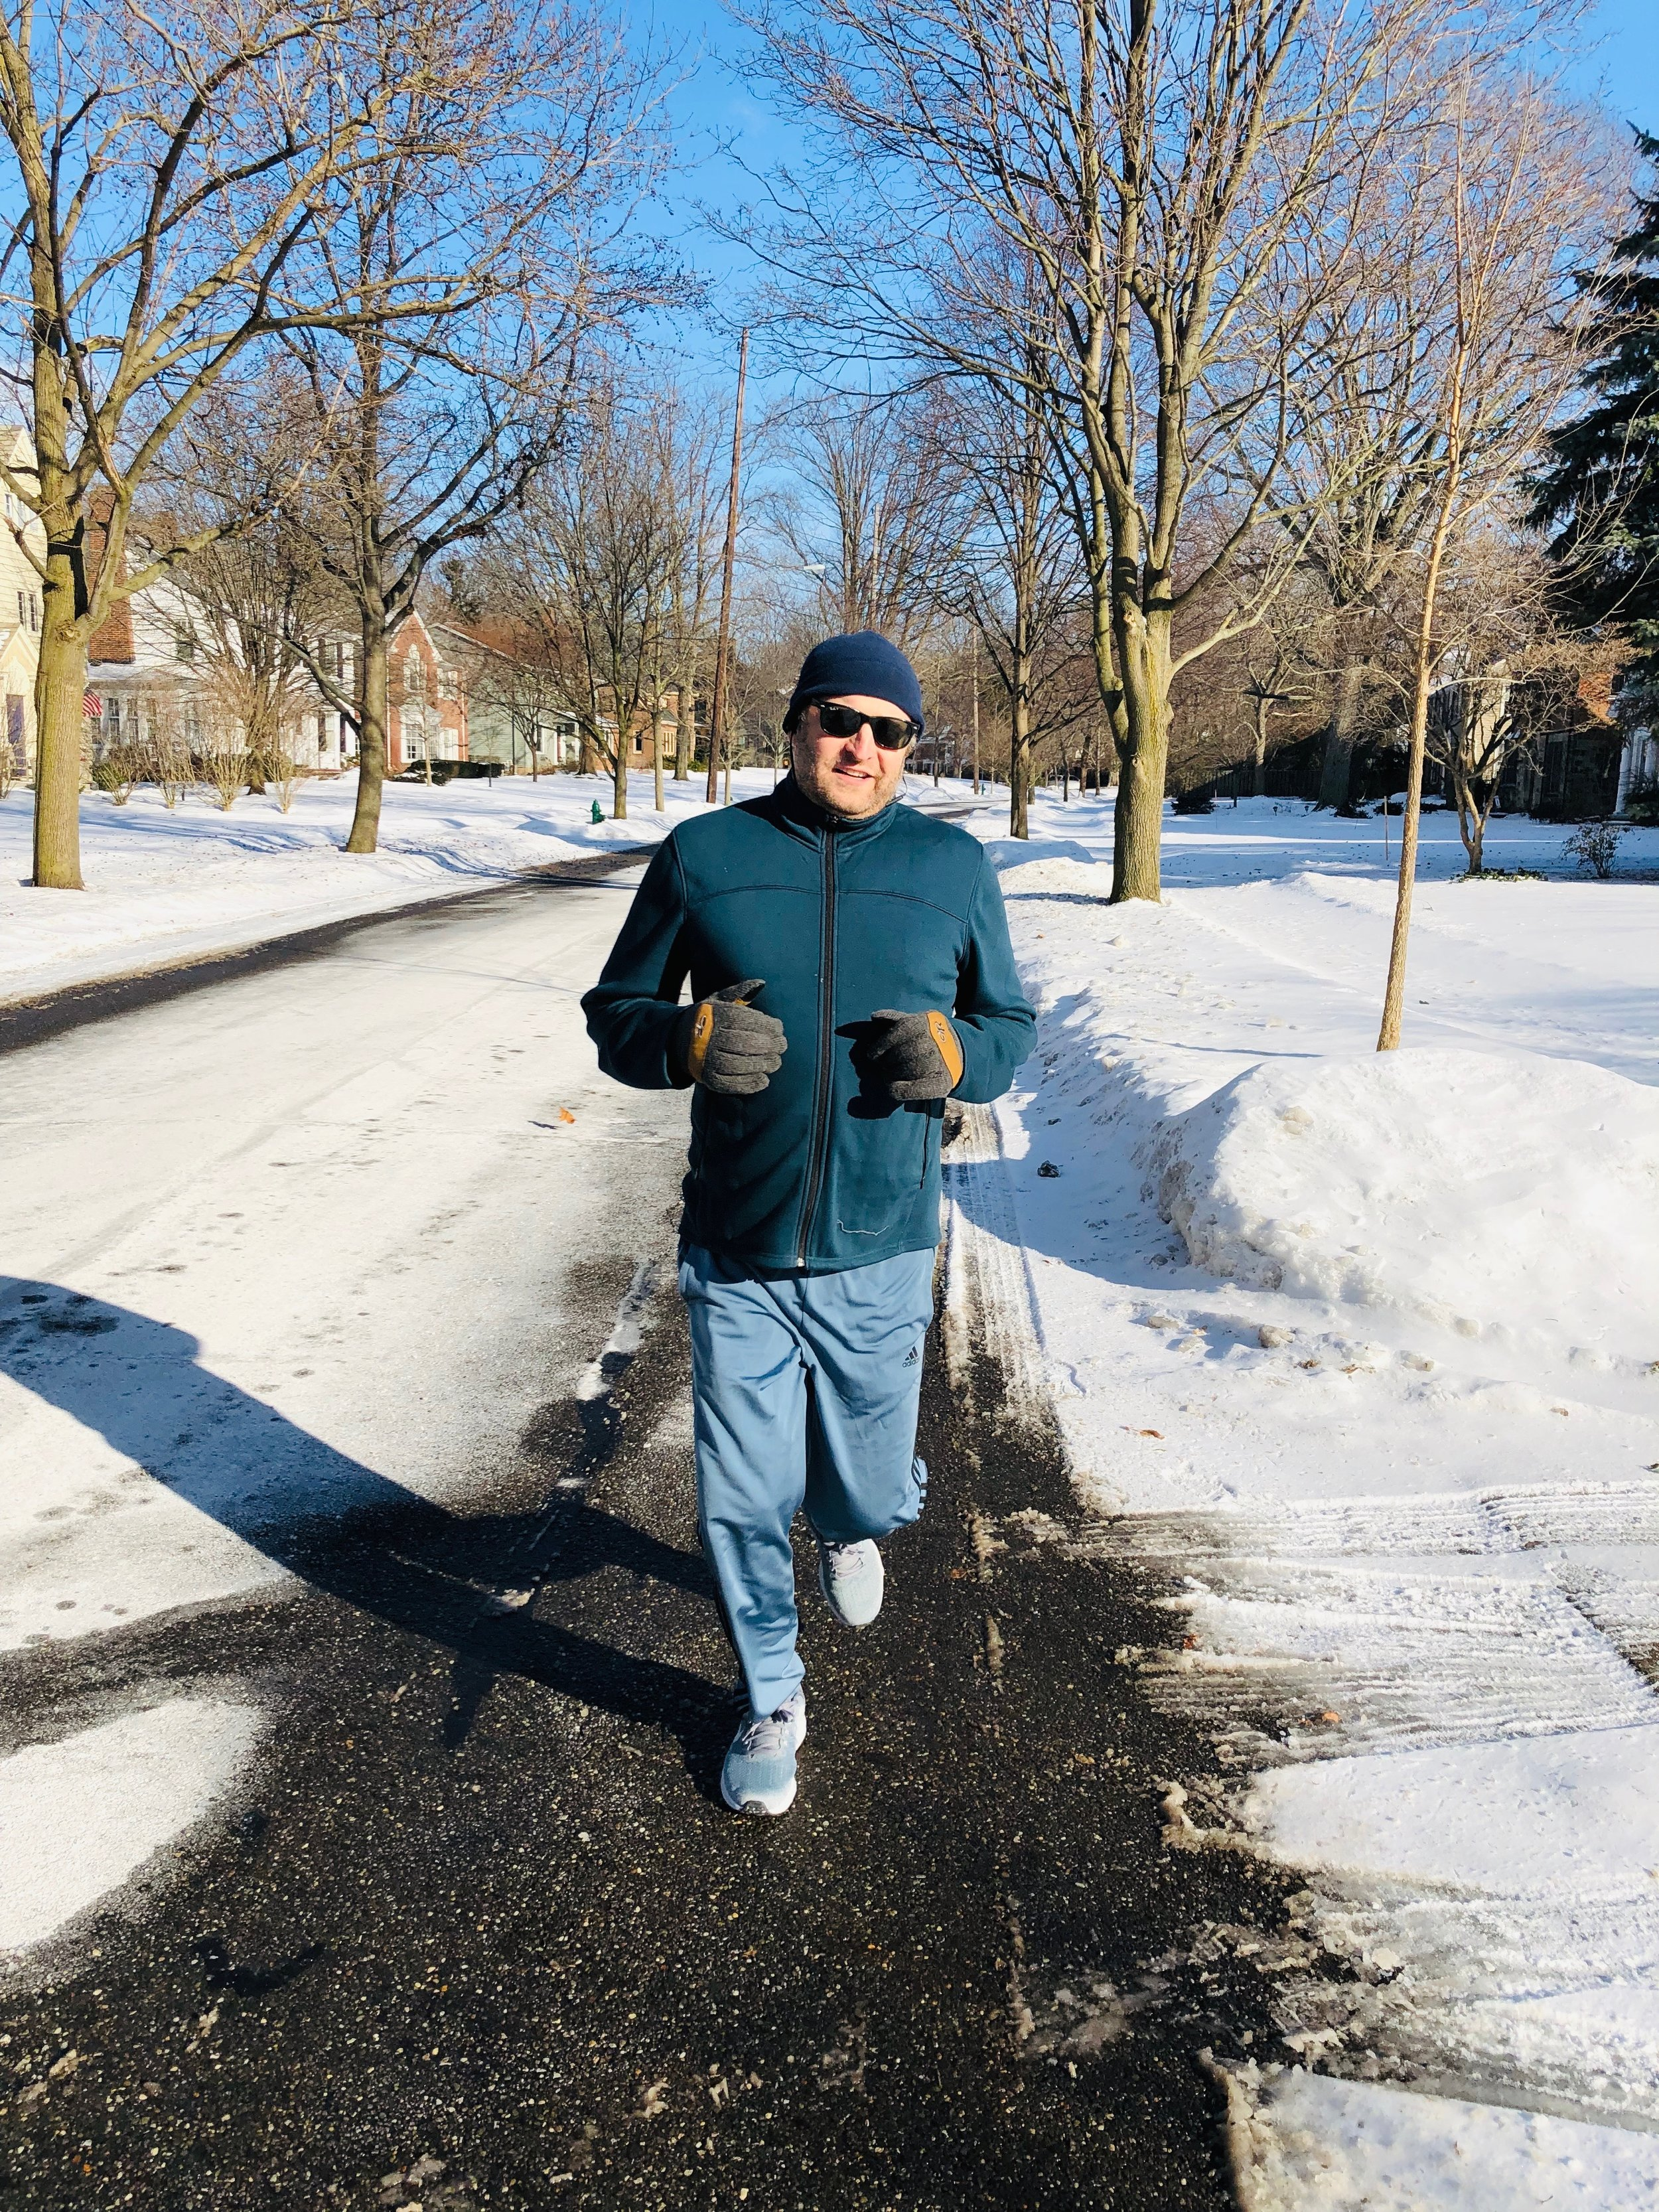 Alex finishing up a run